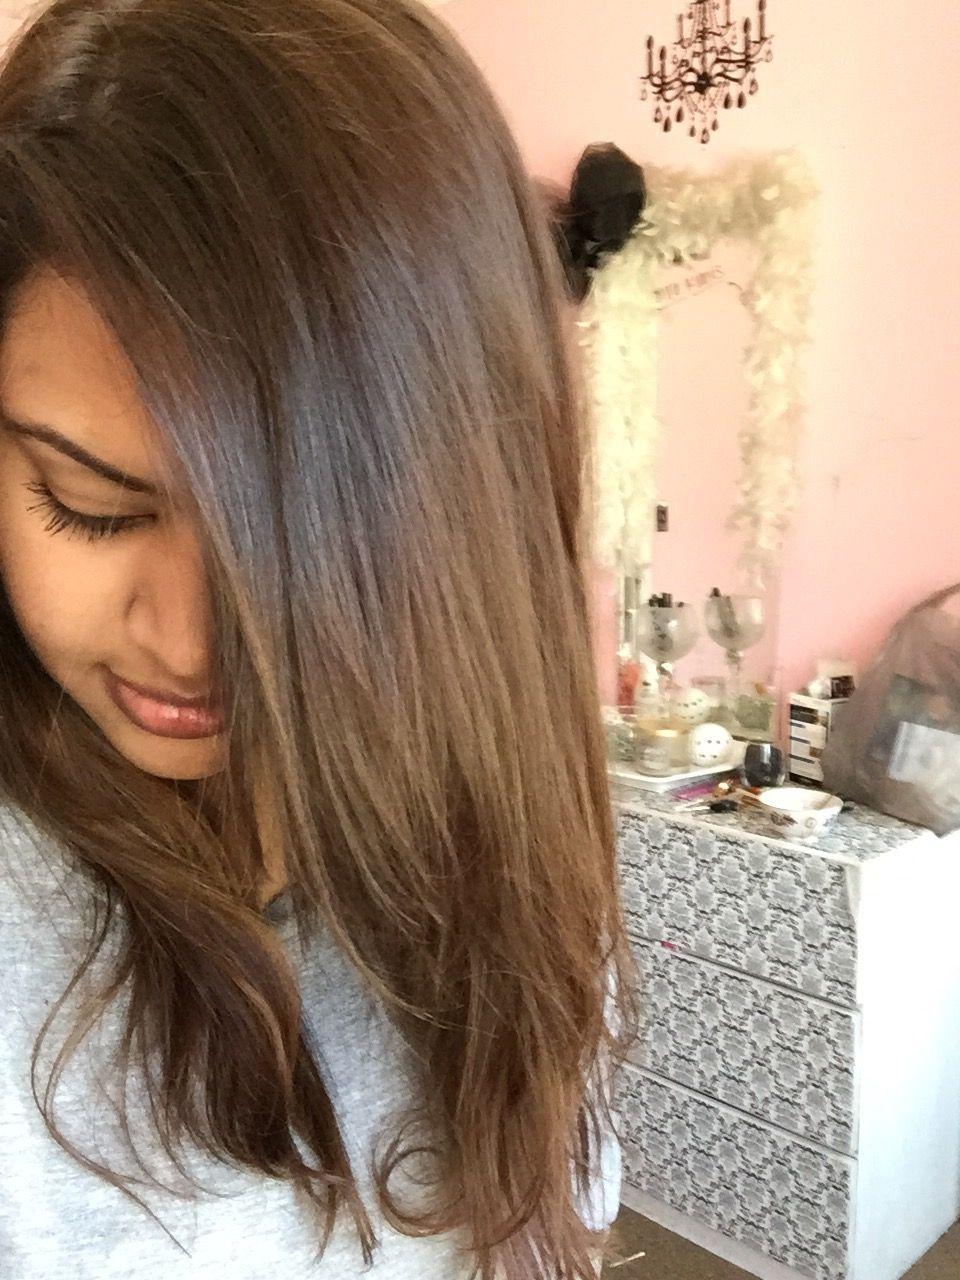 Best At Home Box Dye For Dark Hair Xoxokaymo Black Hair Dye Hair Color For Black Hair Box Hair Dye